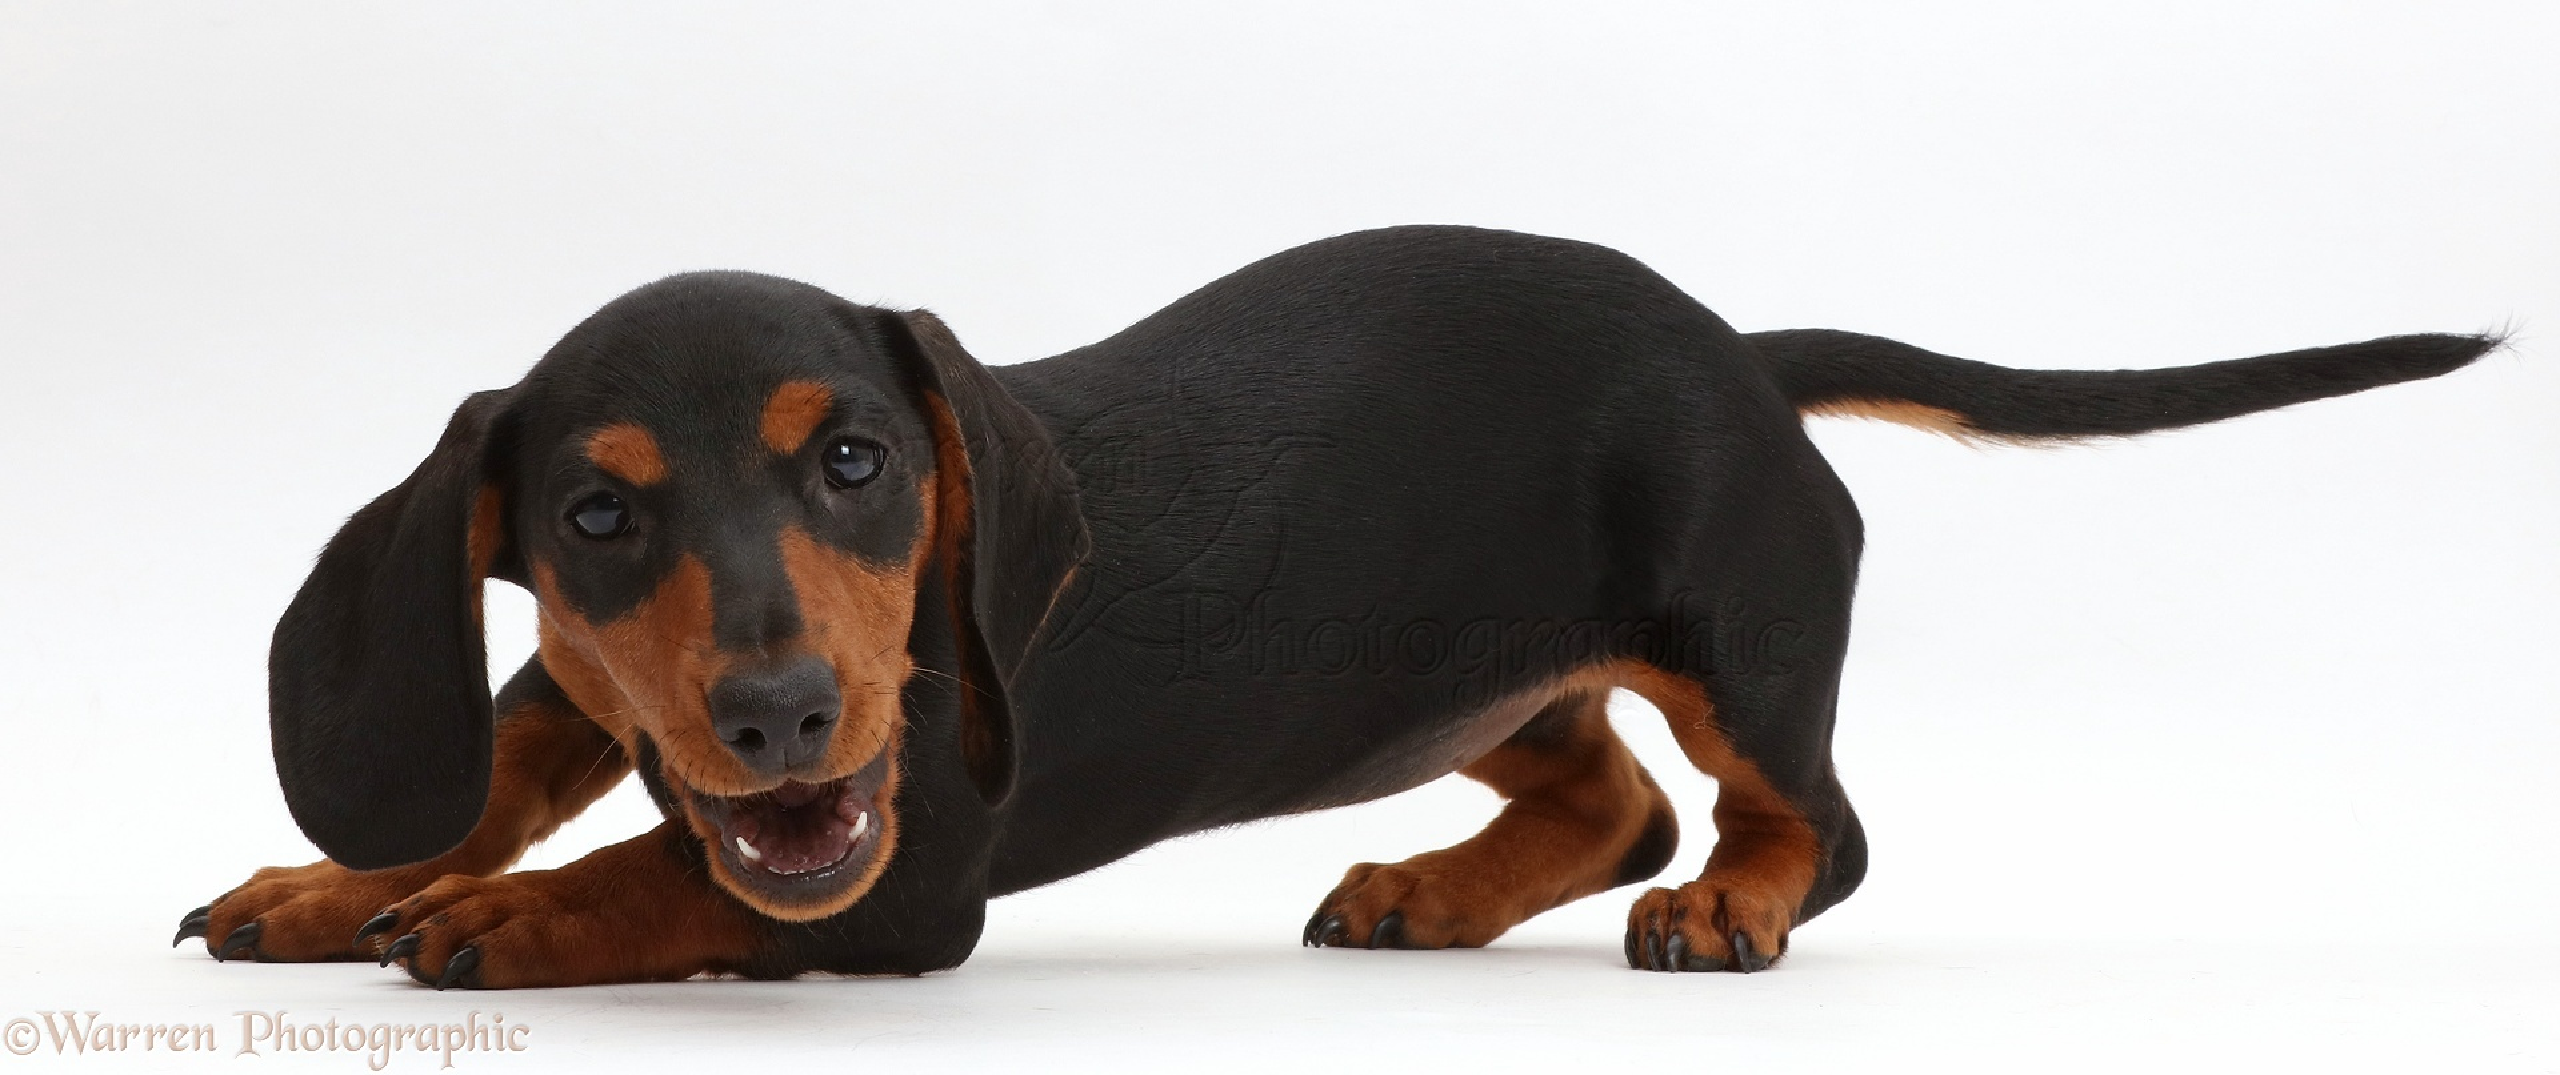 Dog Playful Black And Tan Dachshund Pup Photo Wp43495